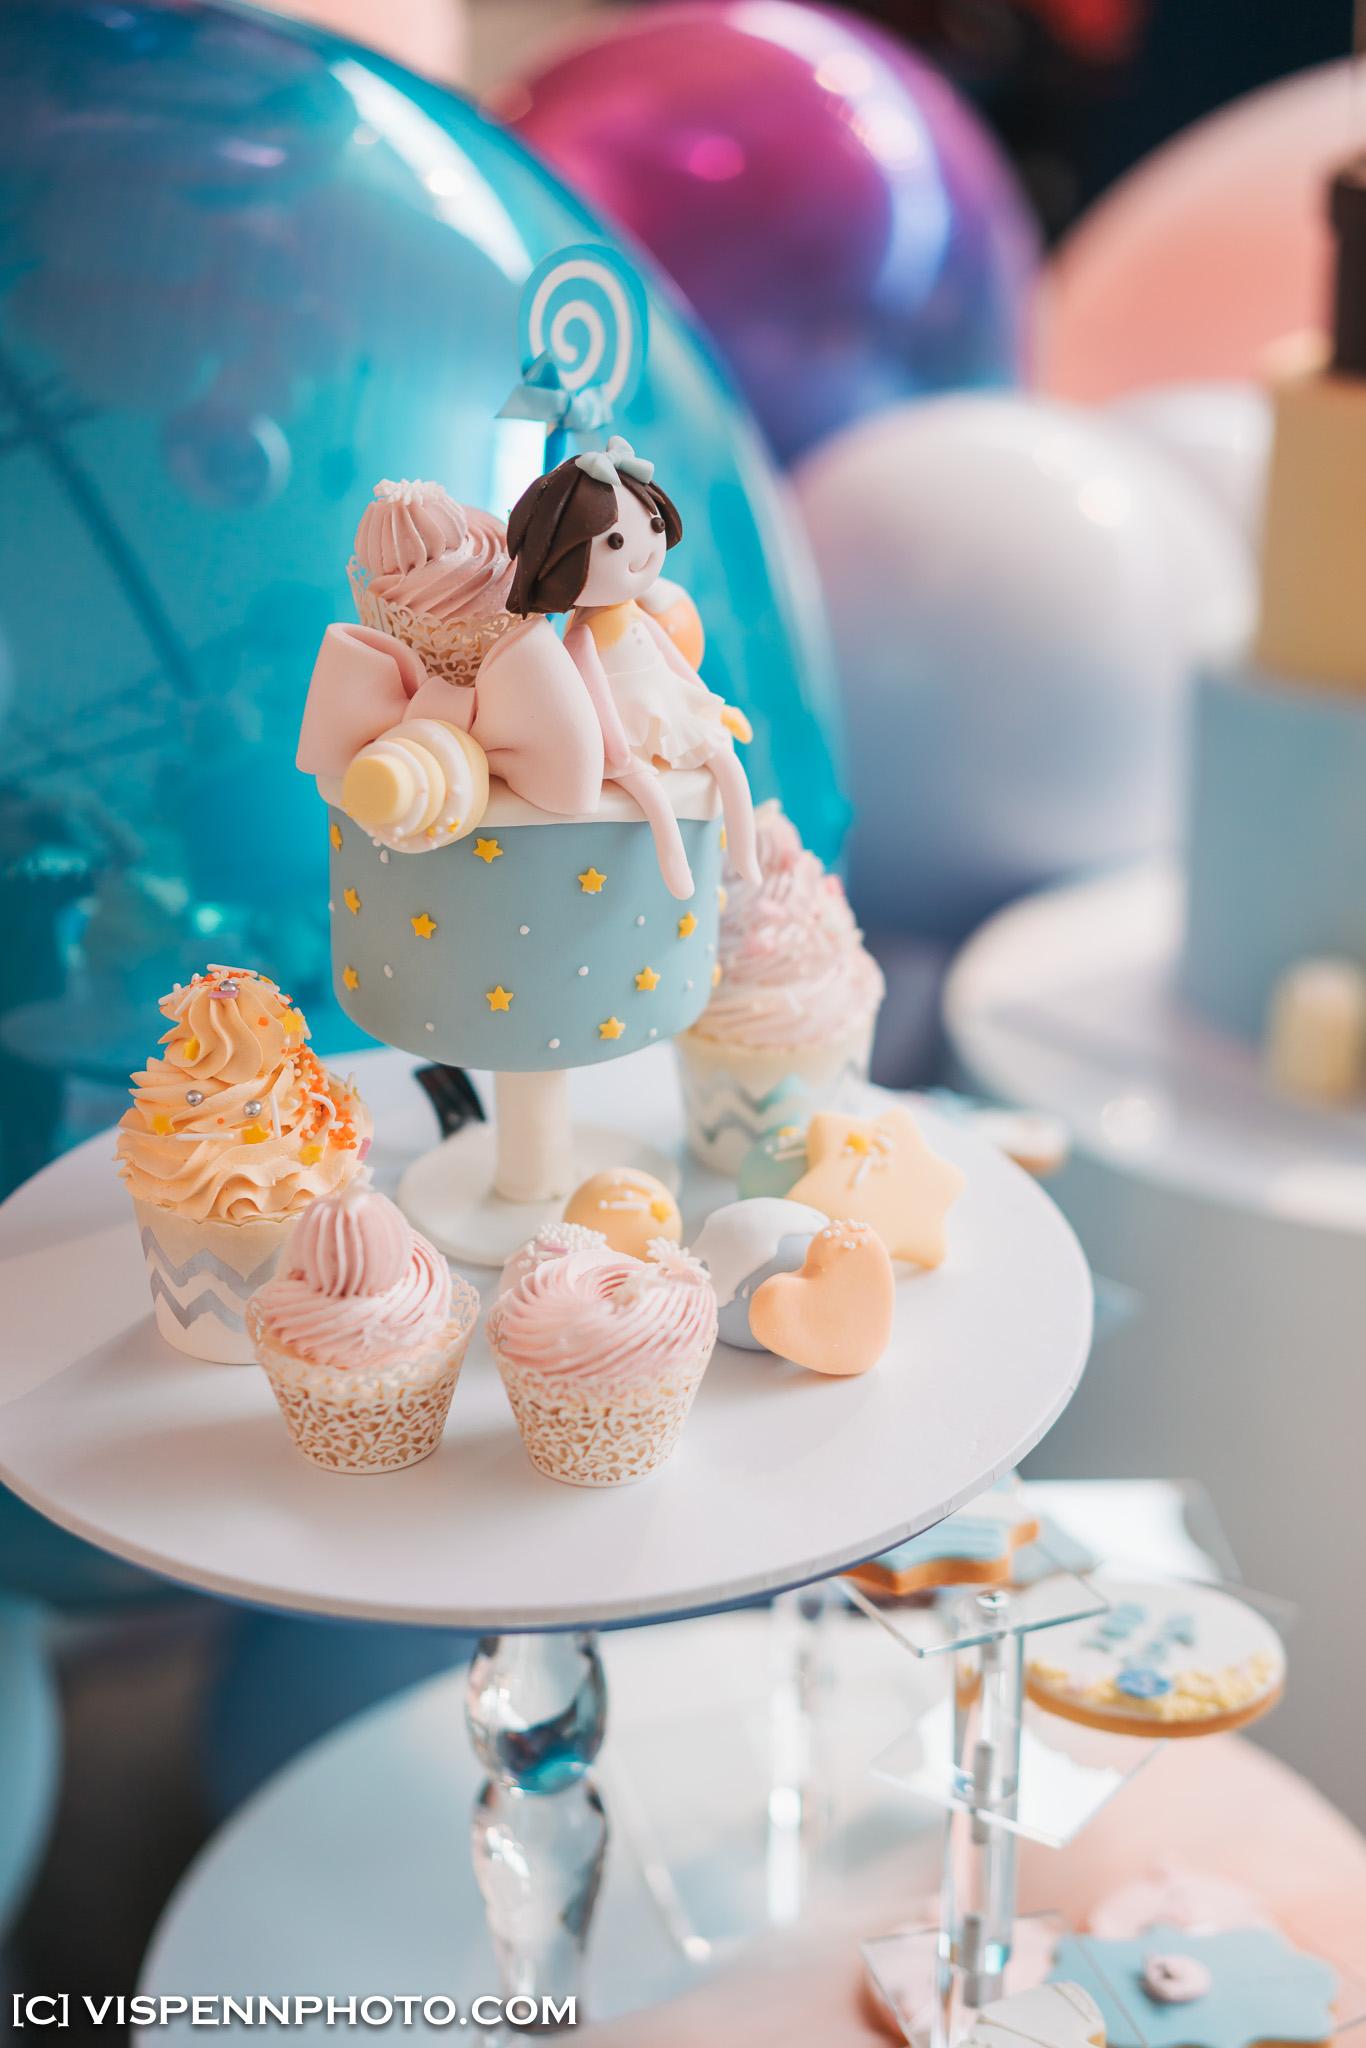 Melbourne Baby Family Birthday Party Photographer 墨尔本 百日宴 满月宴 周岁宴 摄影 VISPENN 100 Days 0100 Sony VISPENN